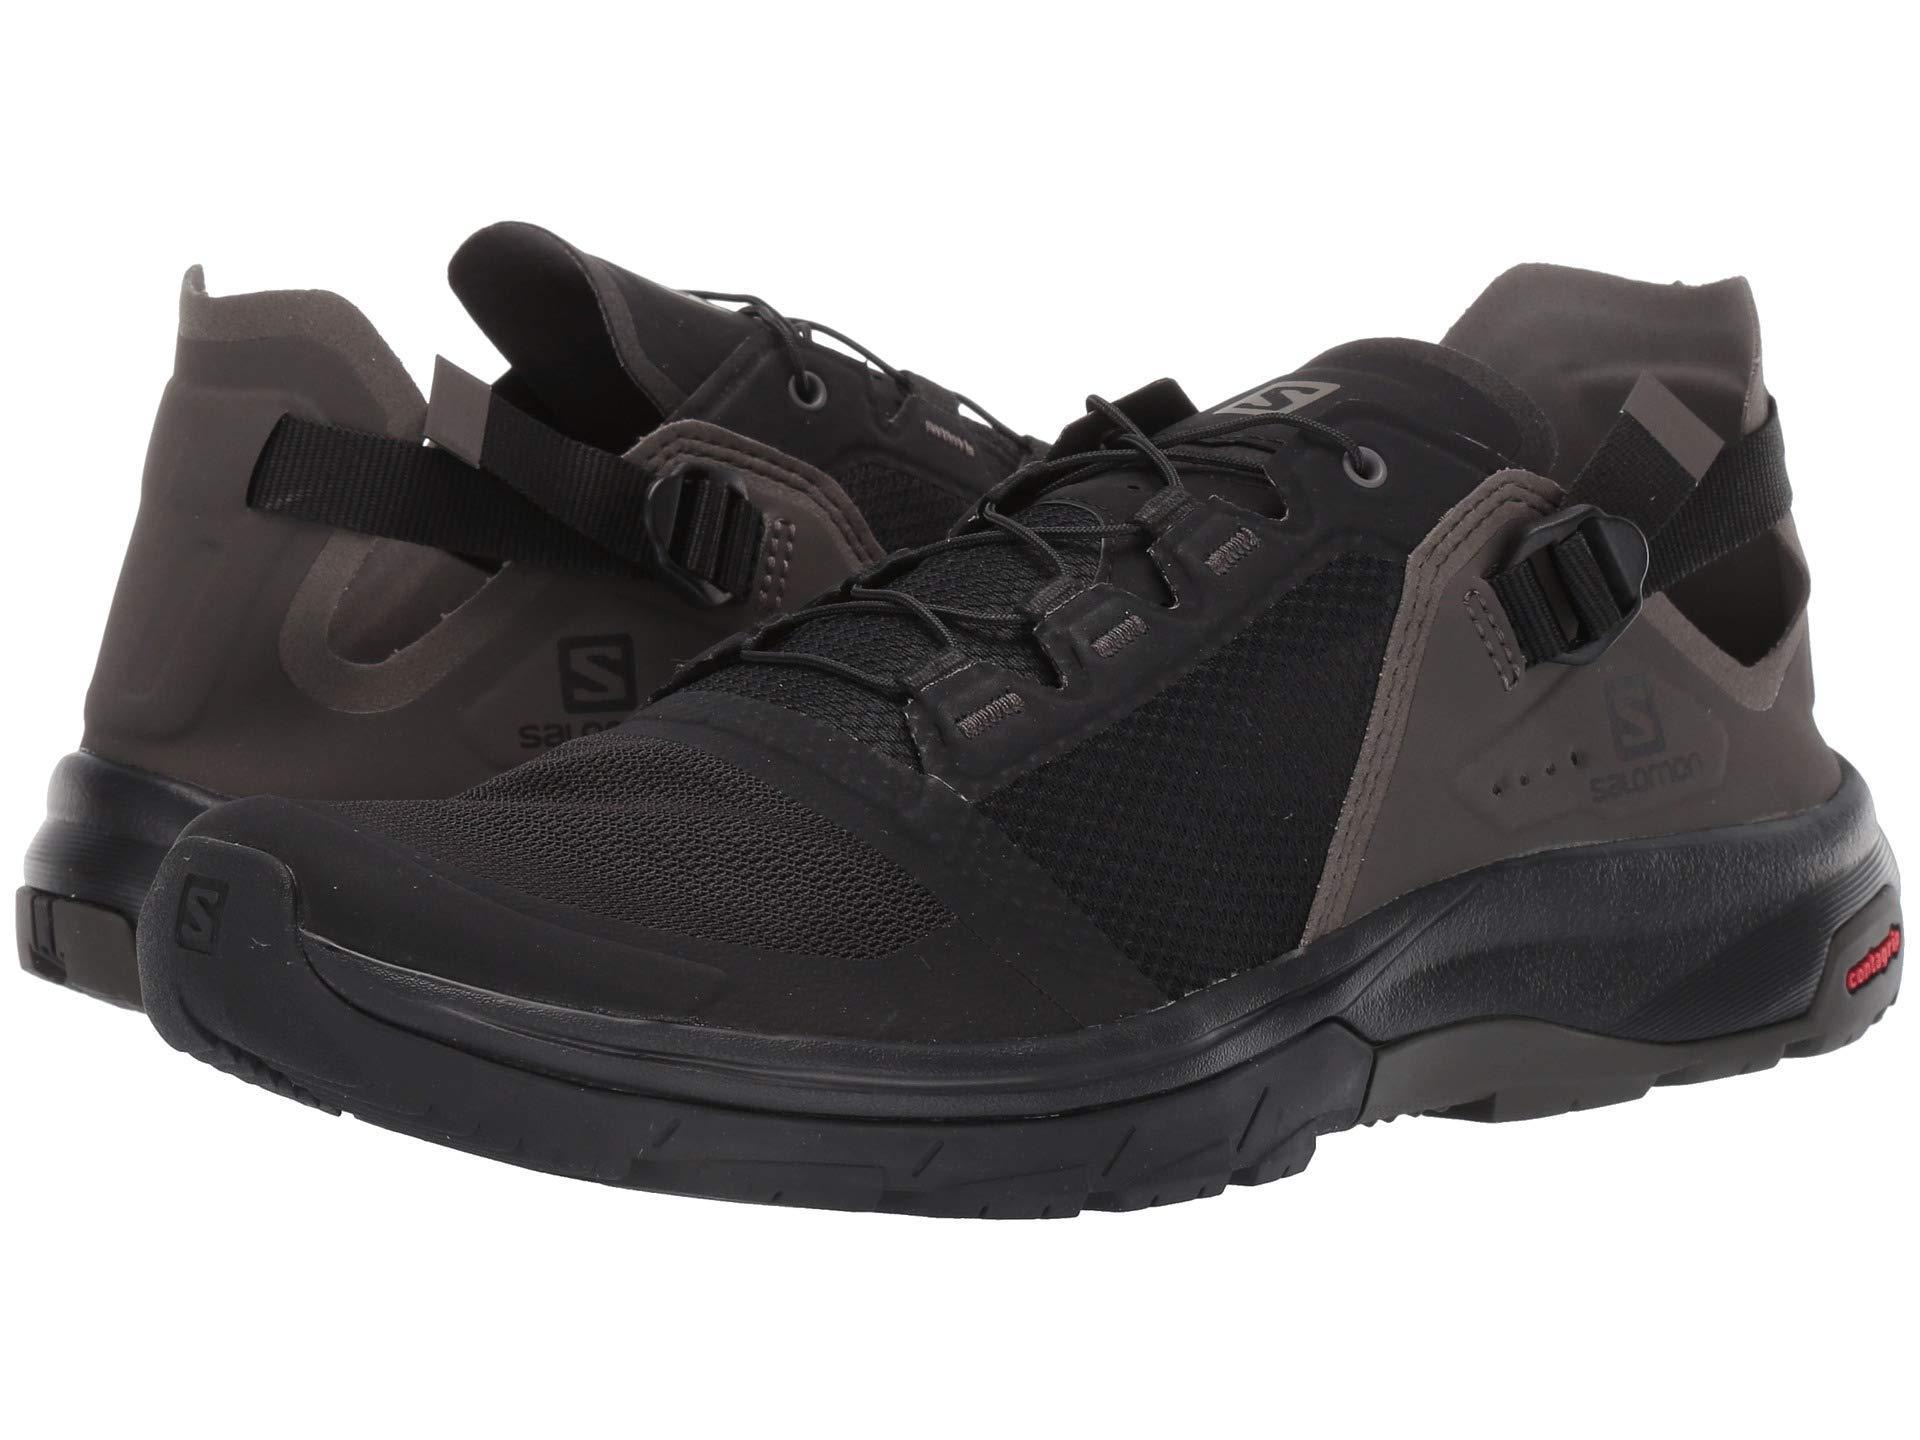 00724dbf1705 Lyst - Yves Salomon Techamphibian 4 Hiking Shoes in Black for Men